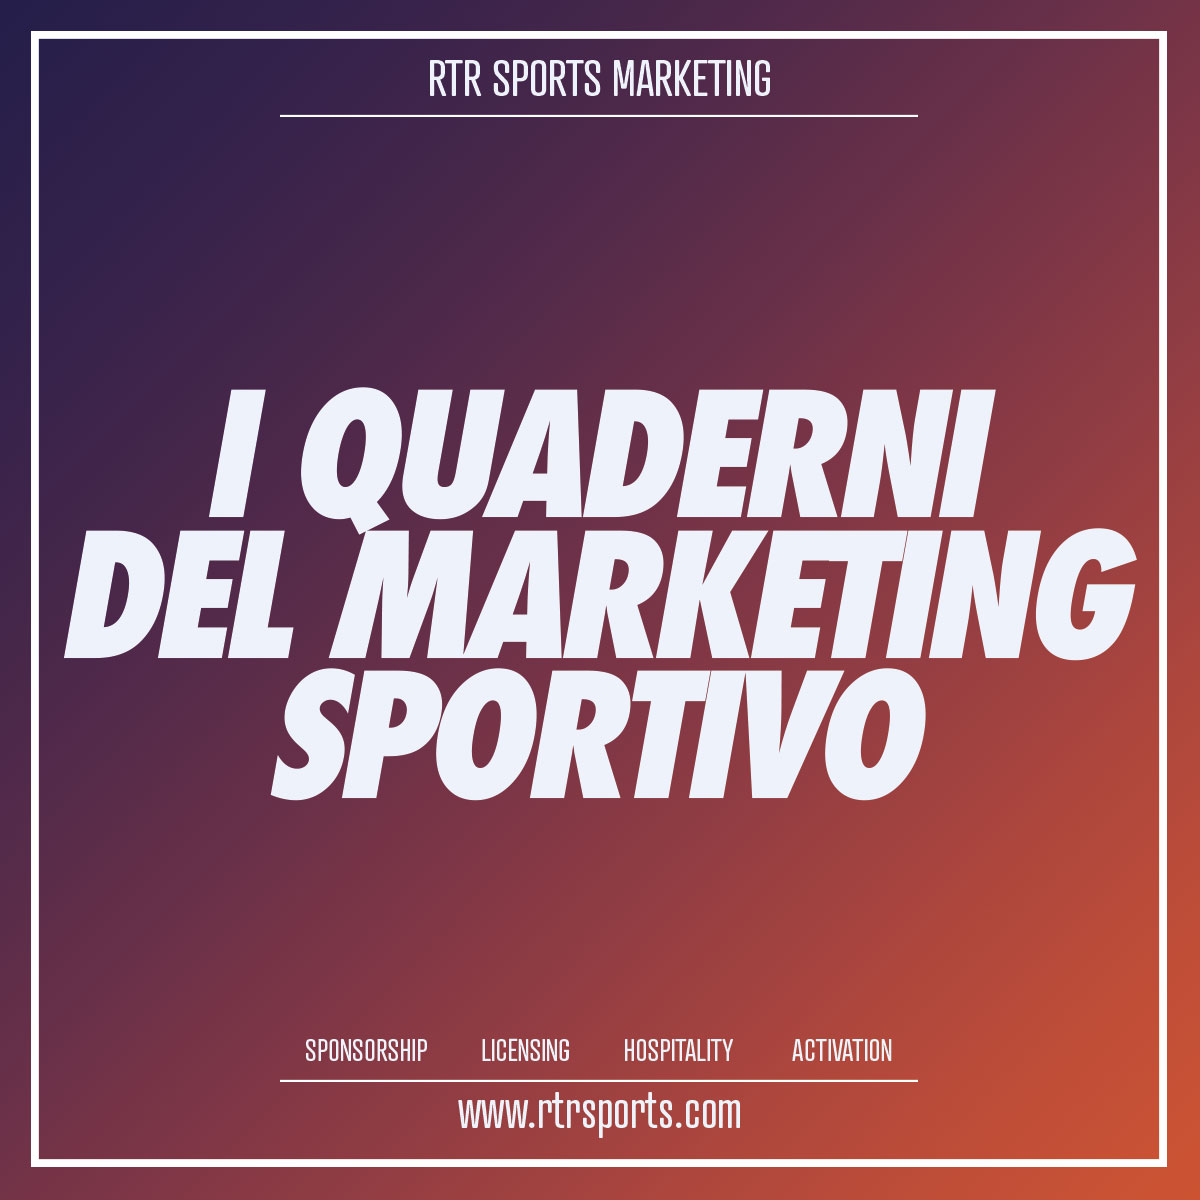 I quaderni del Marketing Sportivo: 4 – Perchè è efficace